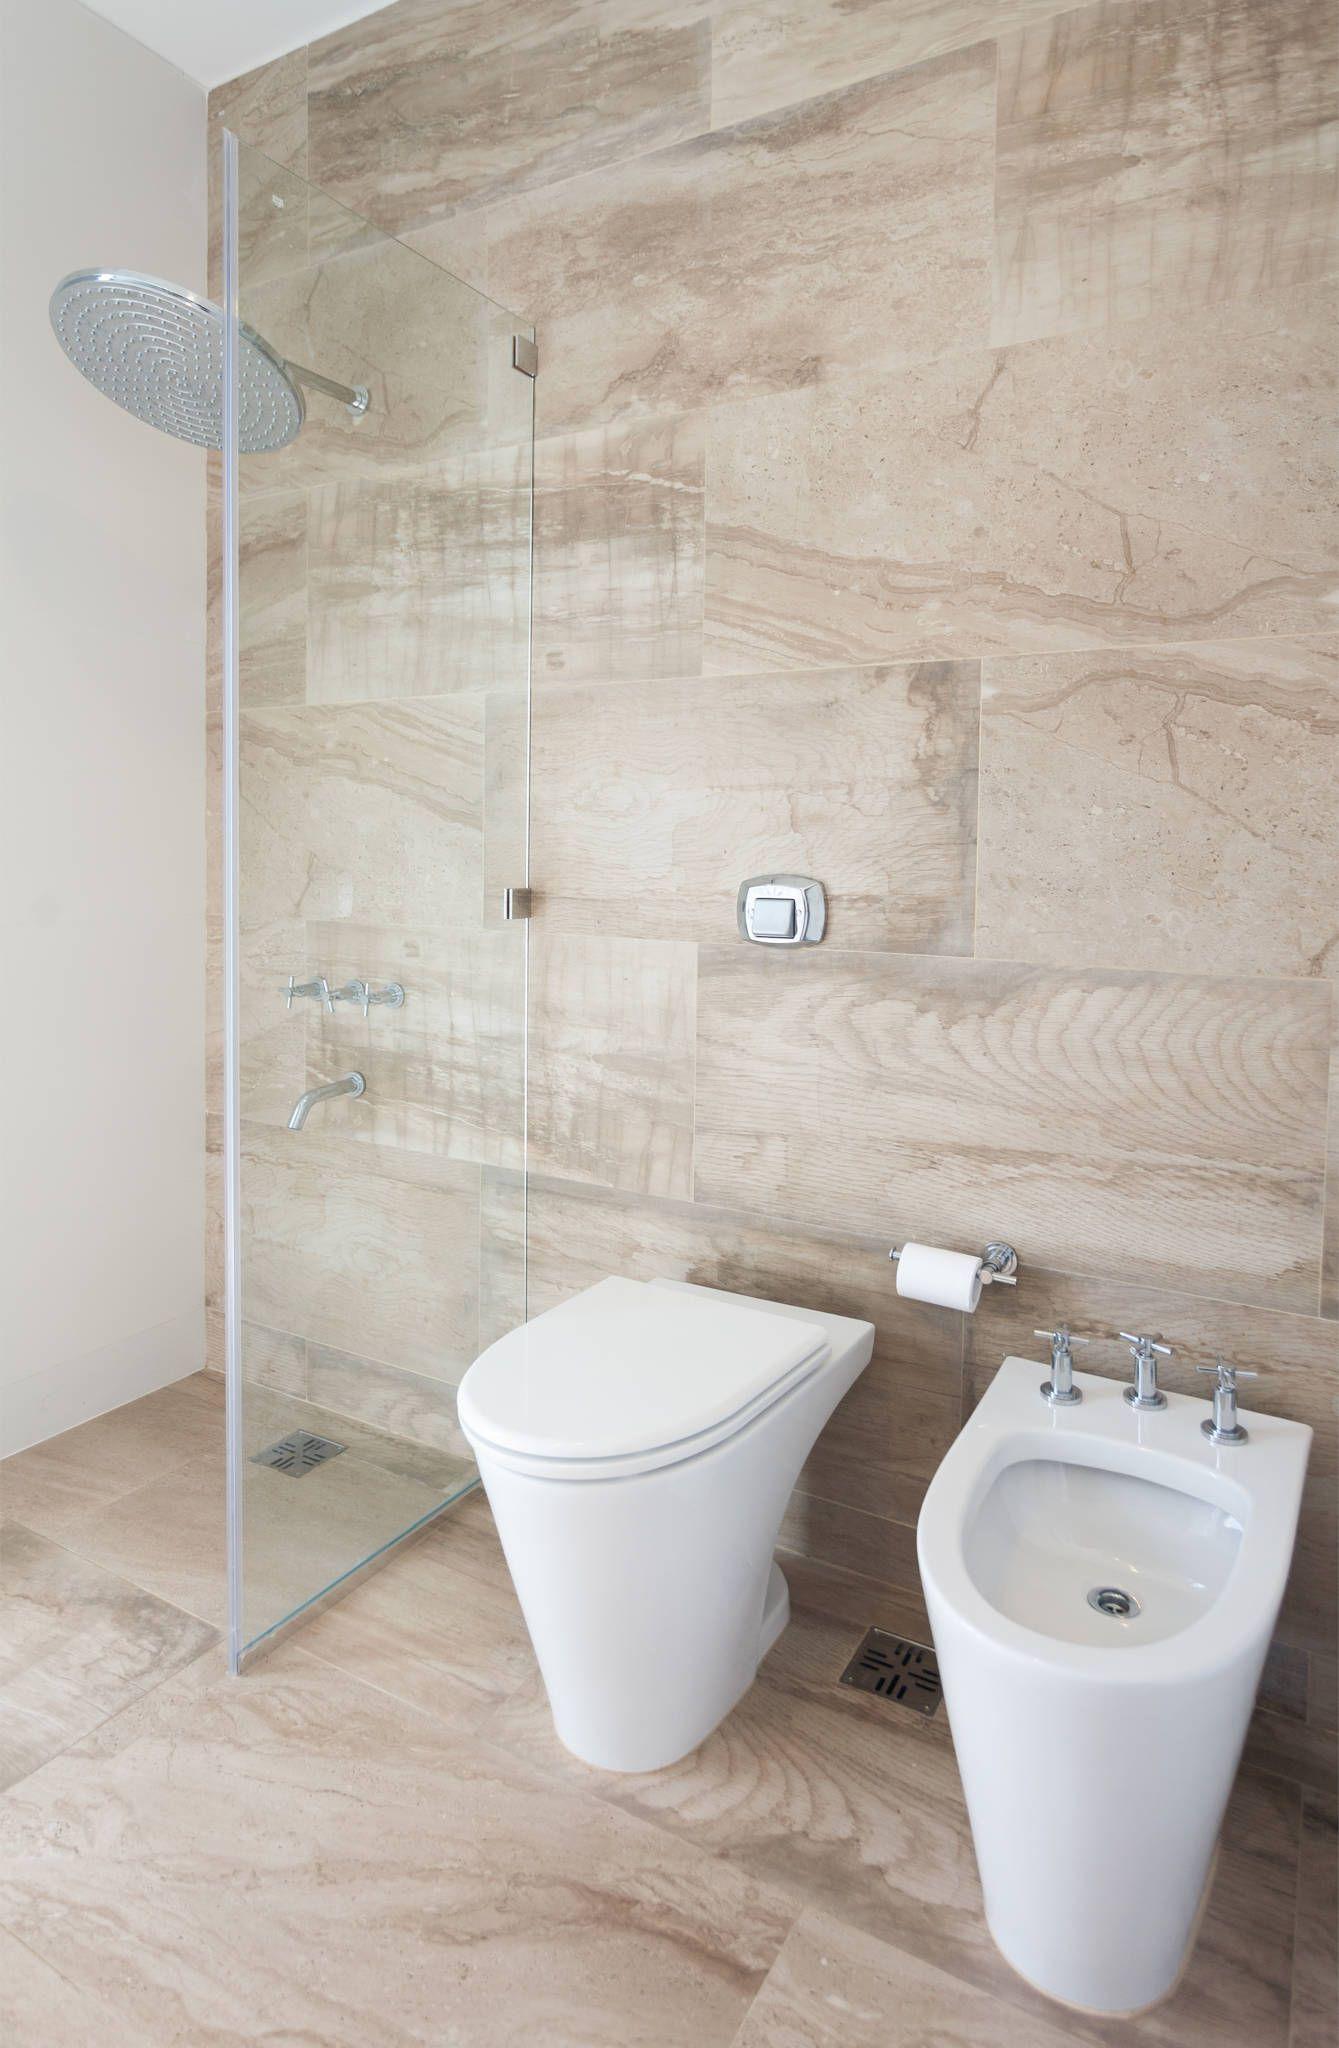 Fotos de ba os de estilo moderno casa c puerto roldan - Banos con estilo moderno ...